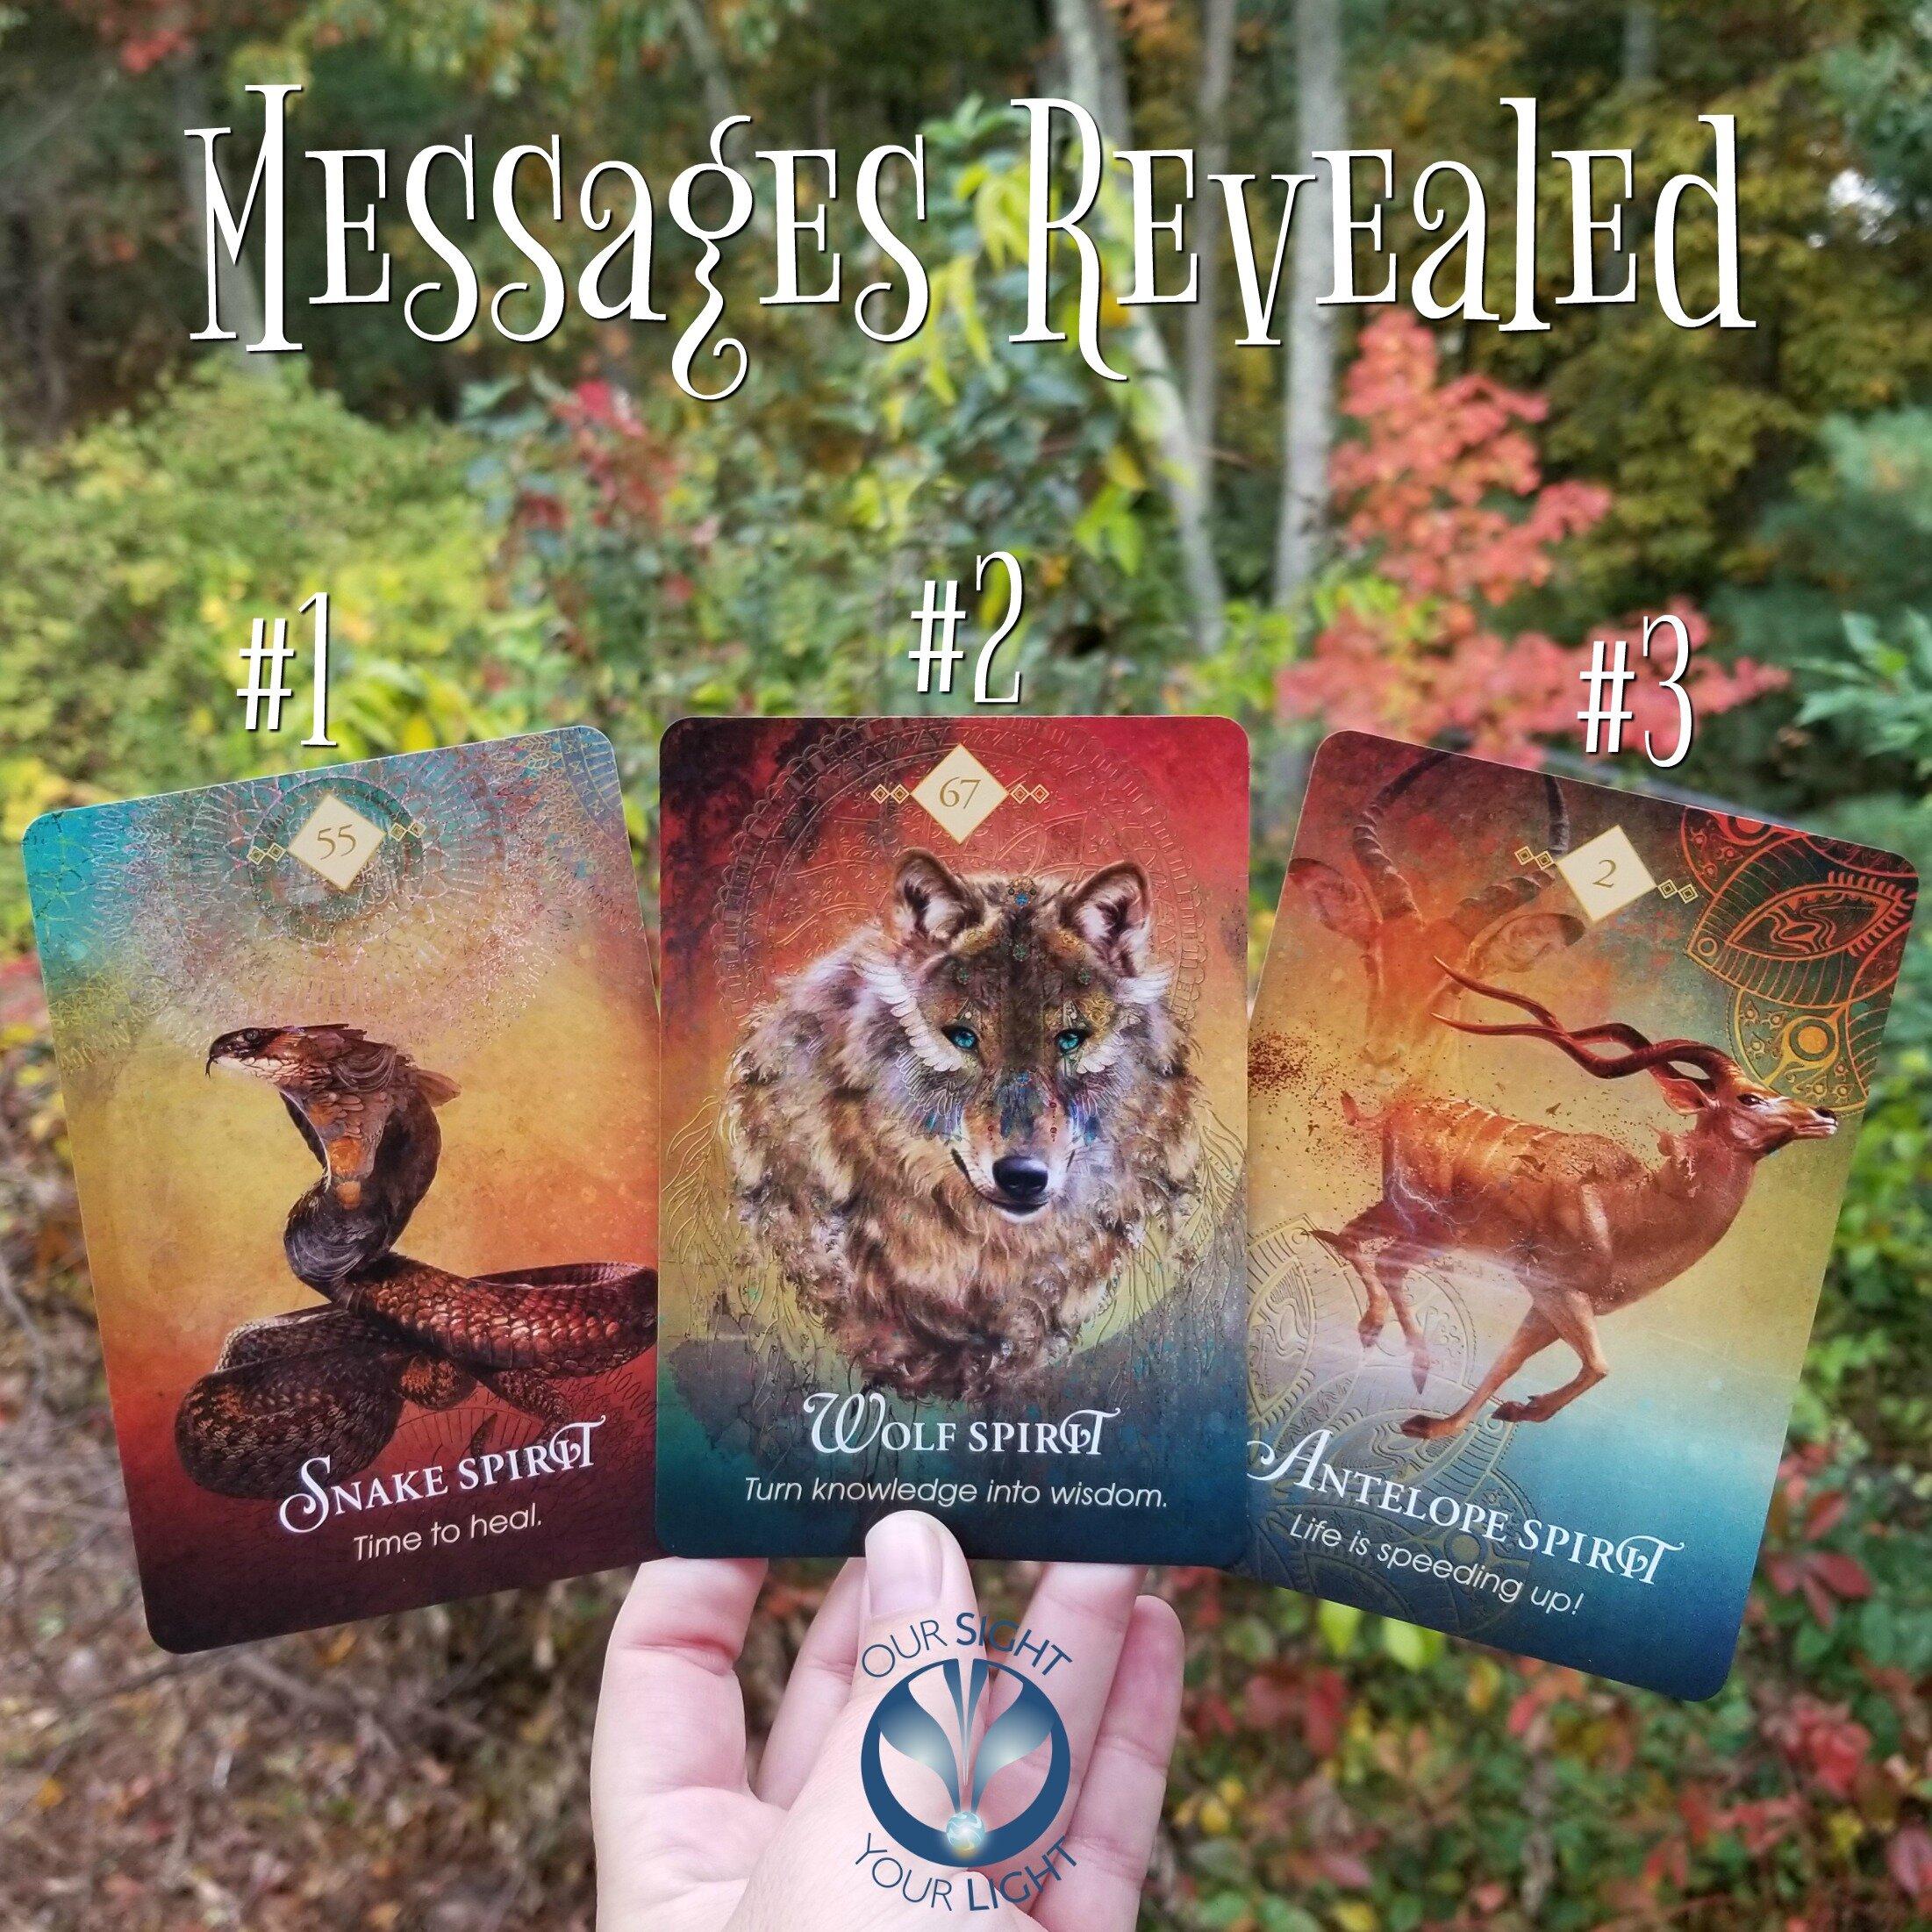 #OracleMonday Messages Revealed - SPIRIT ANIMAL ORACLE by Colette Baron-Reid, Snake Spirit, Wolf Spirit, Antelope Spirit